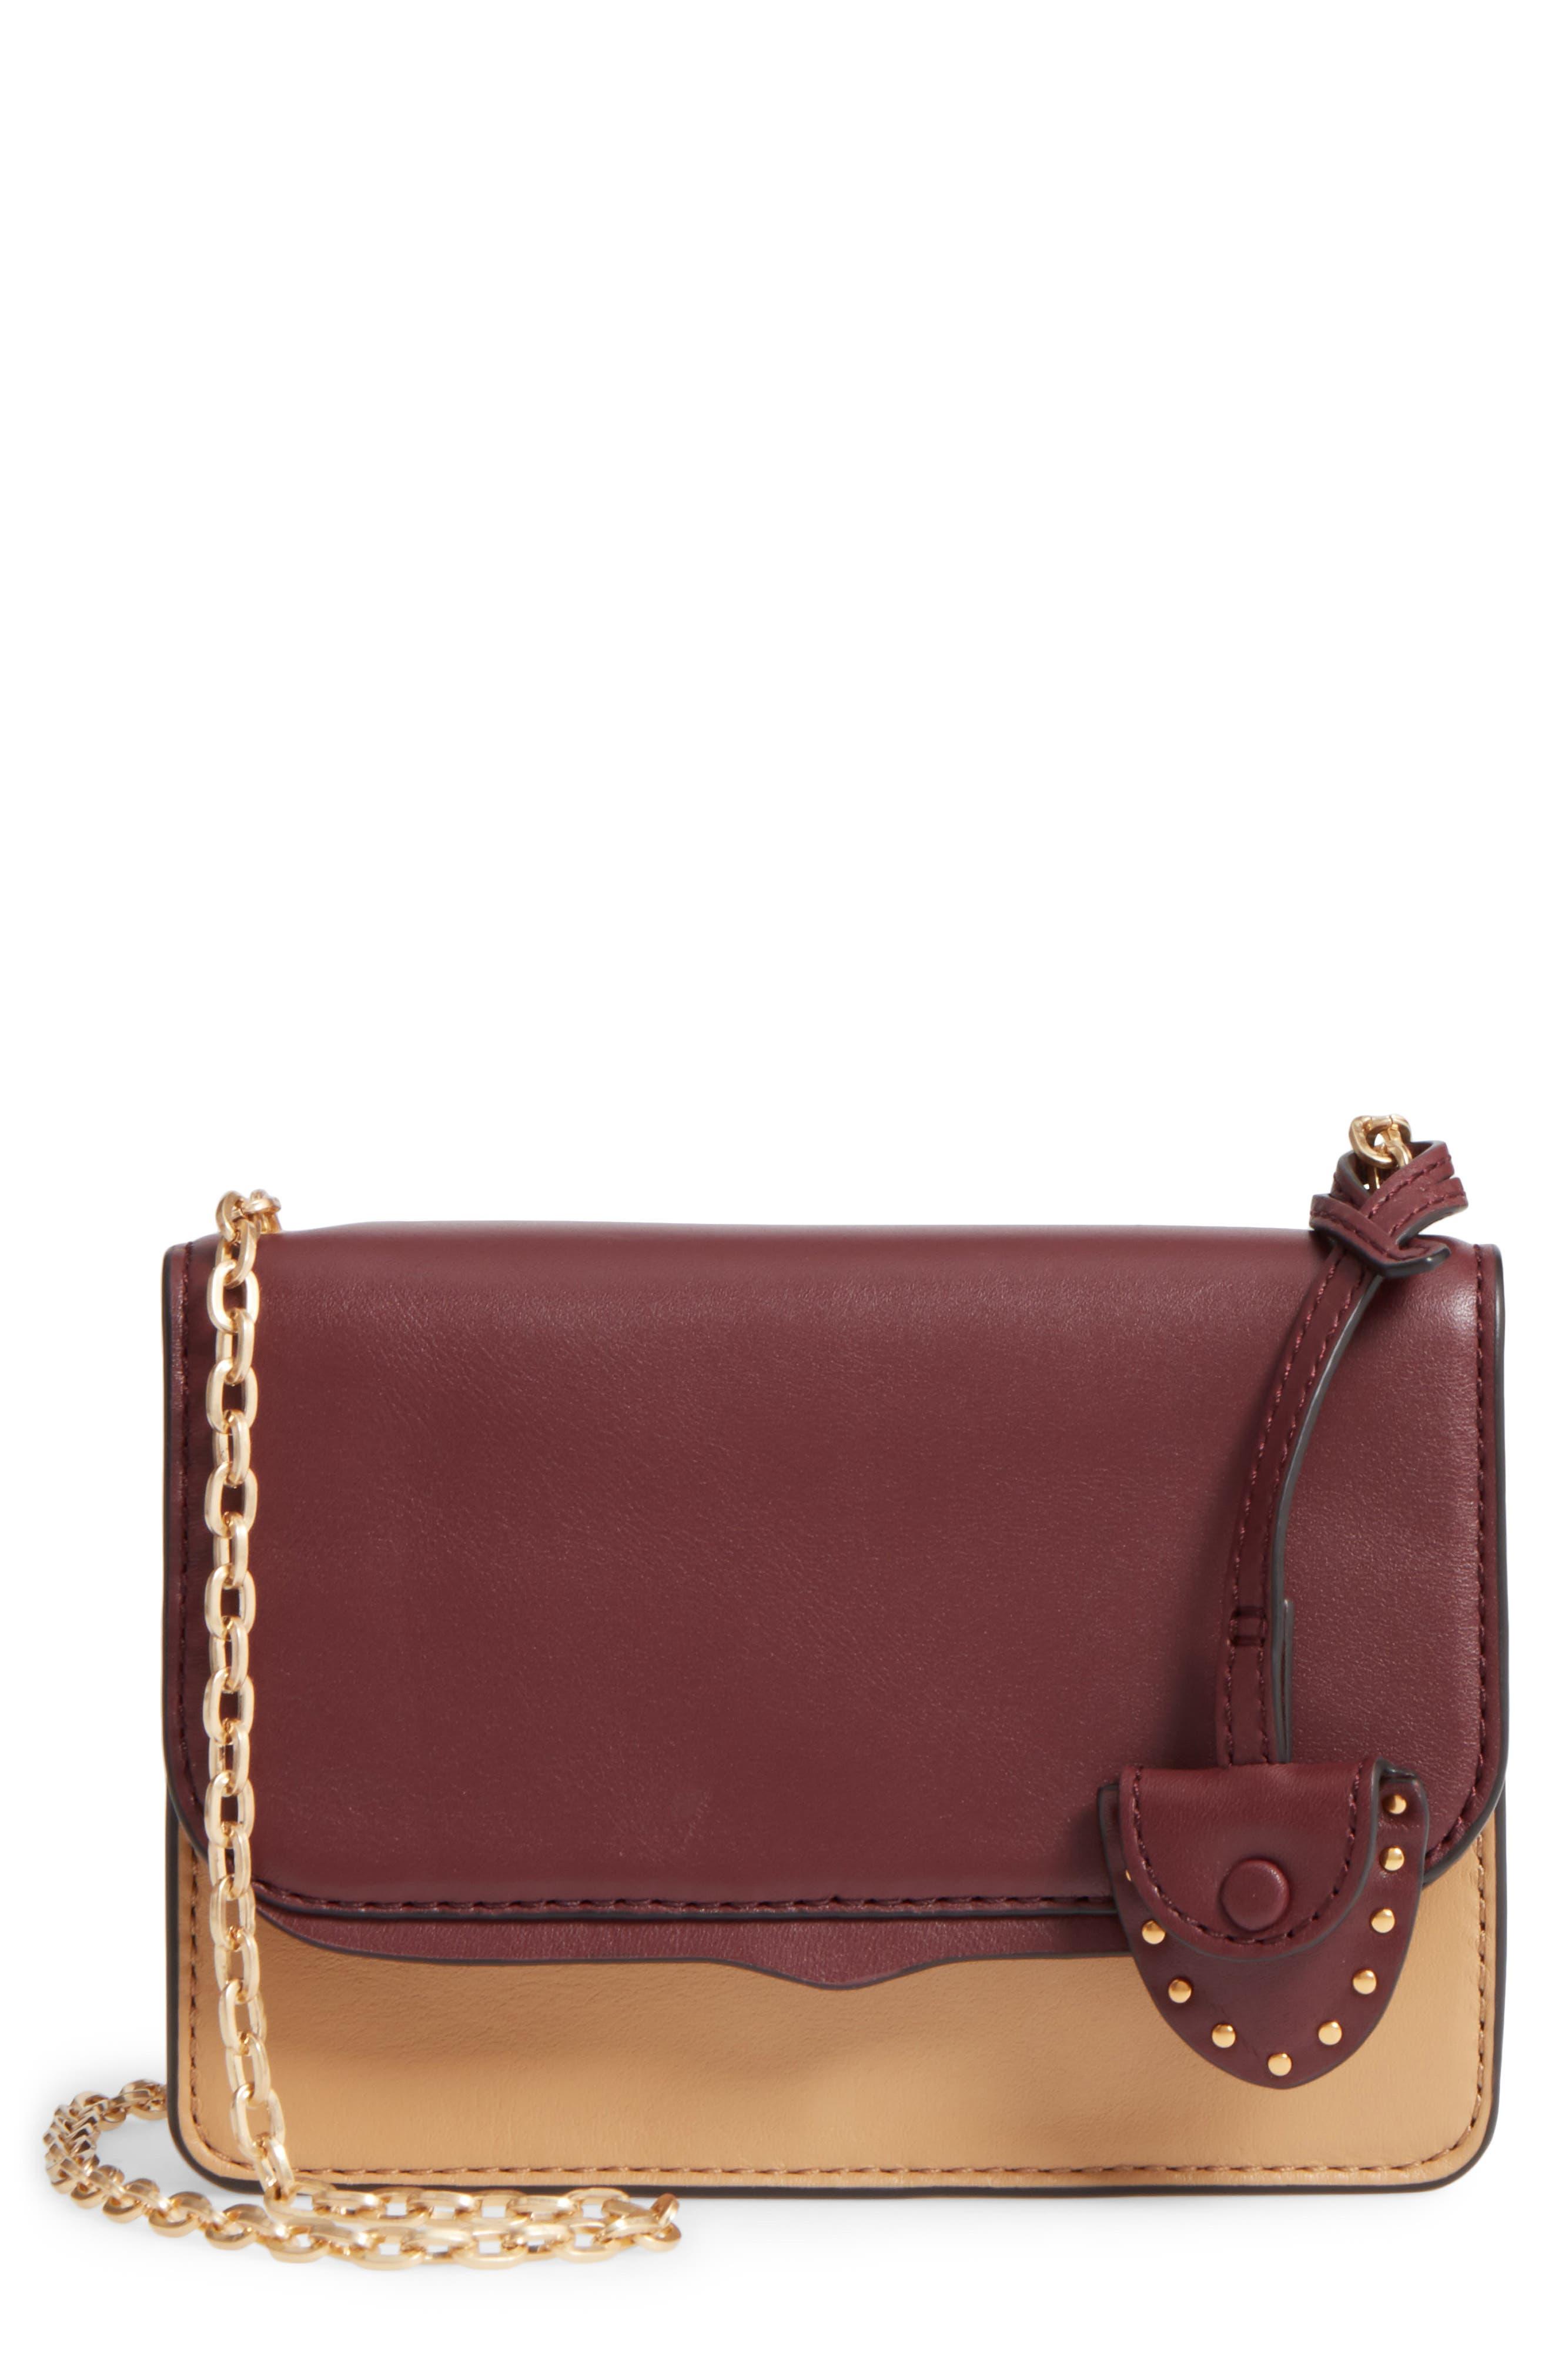 Alternate Image 1 Selected - Rebecca Minkoff Mini Chain Leather Crossbody Bag